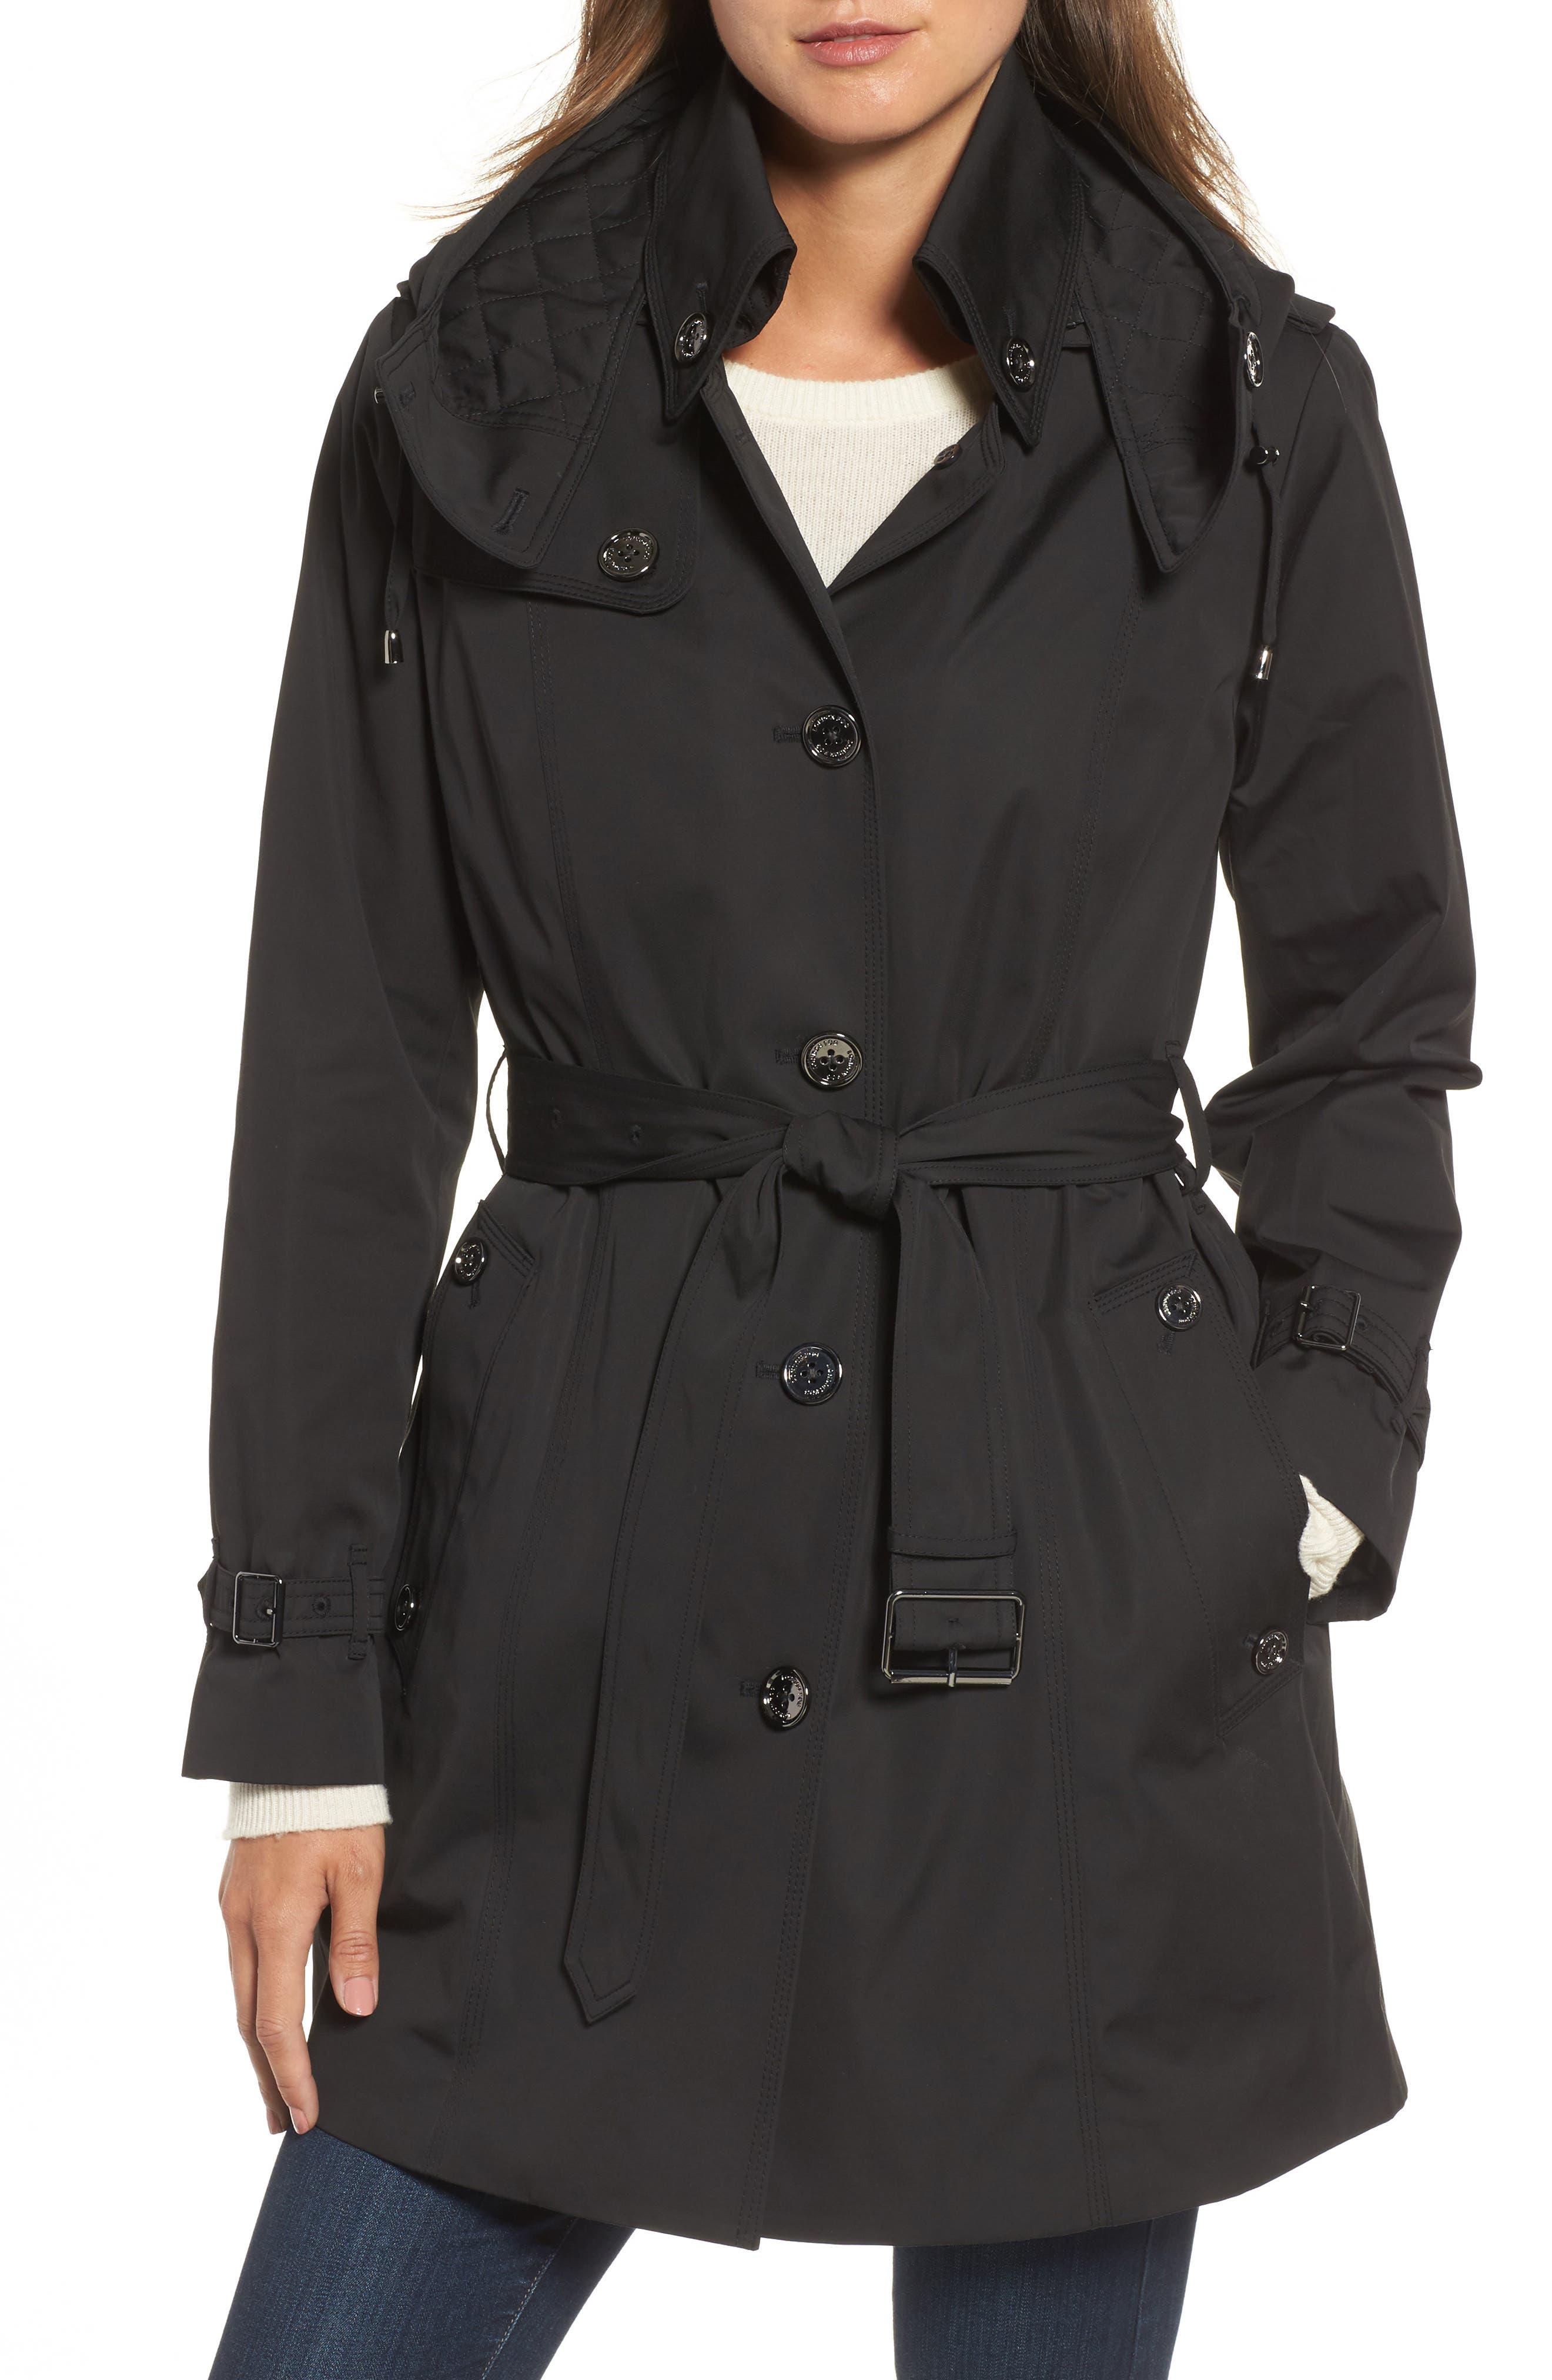 Short Trench Coat,                             Main thumbnail 1, color,                             001